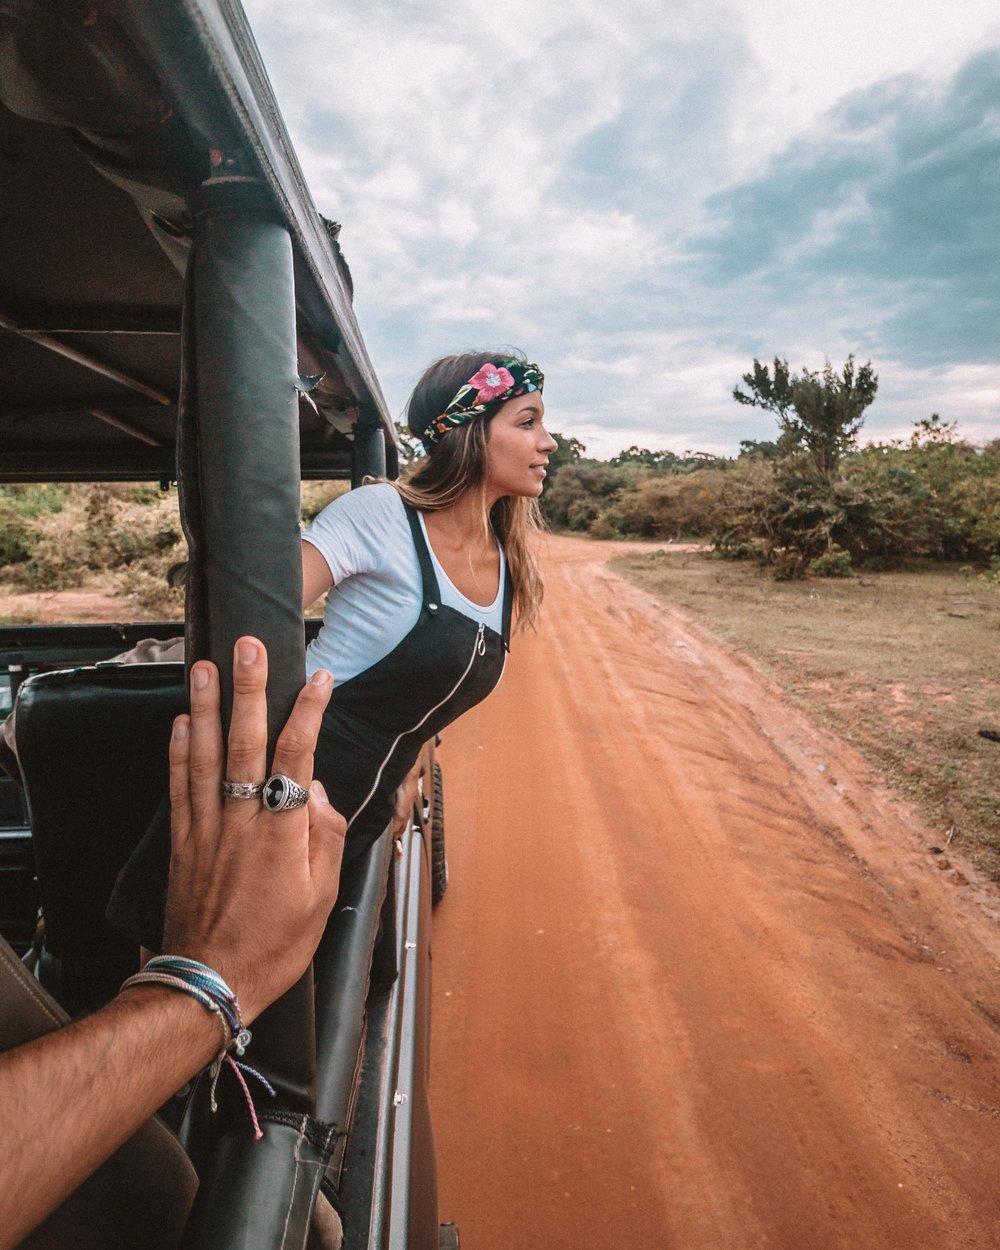 Yala national park Chena Huts uga escapes safari ride experience wildlife adventure photography